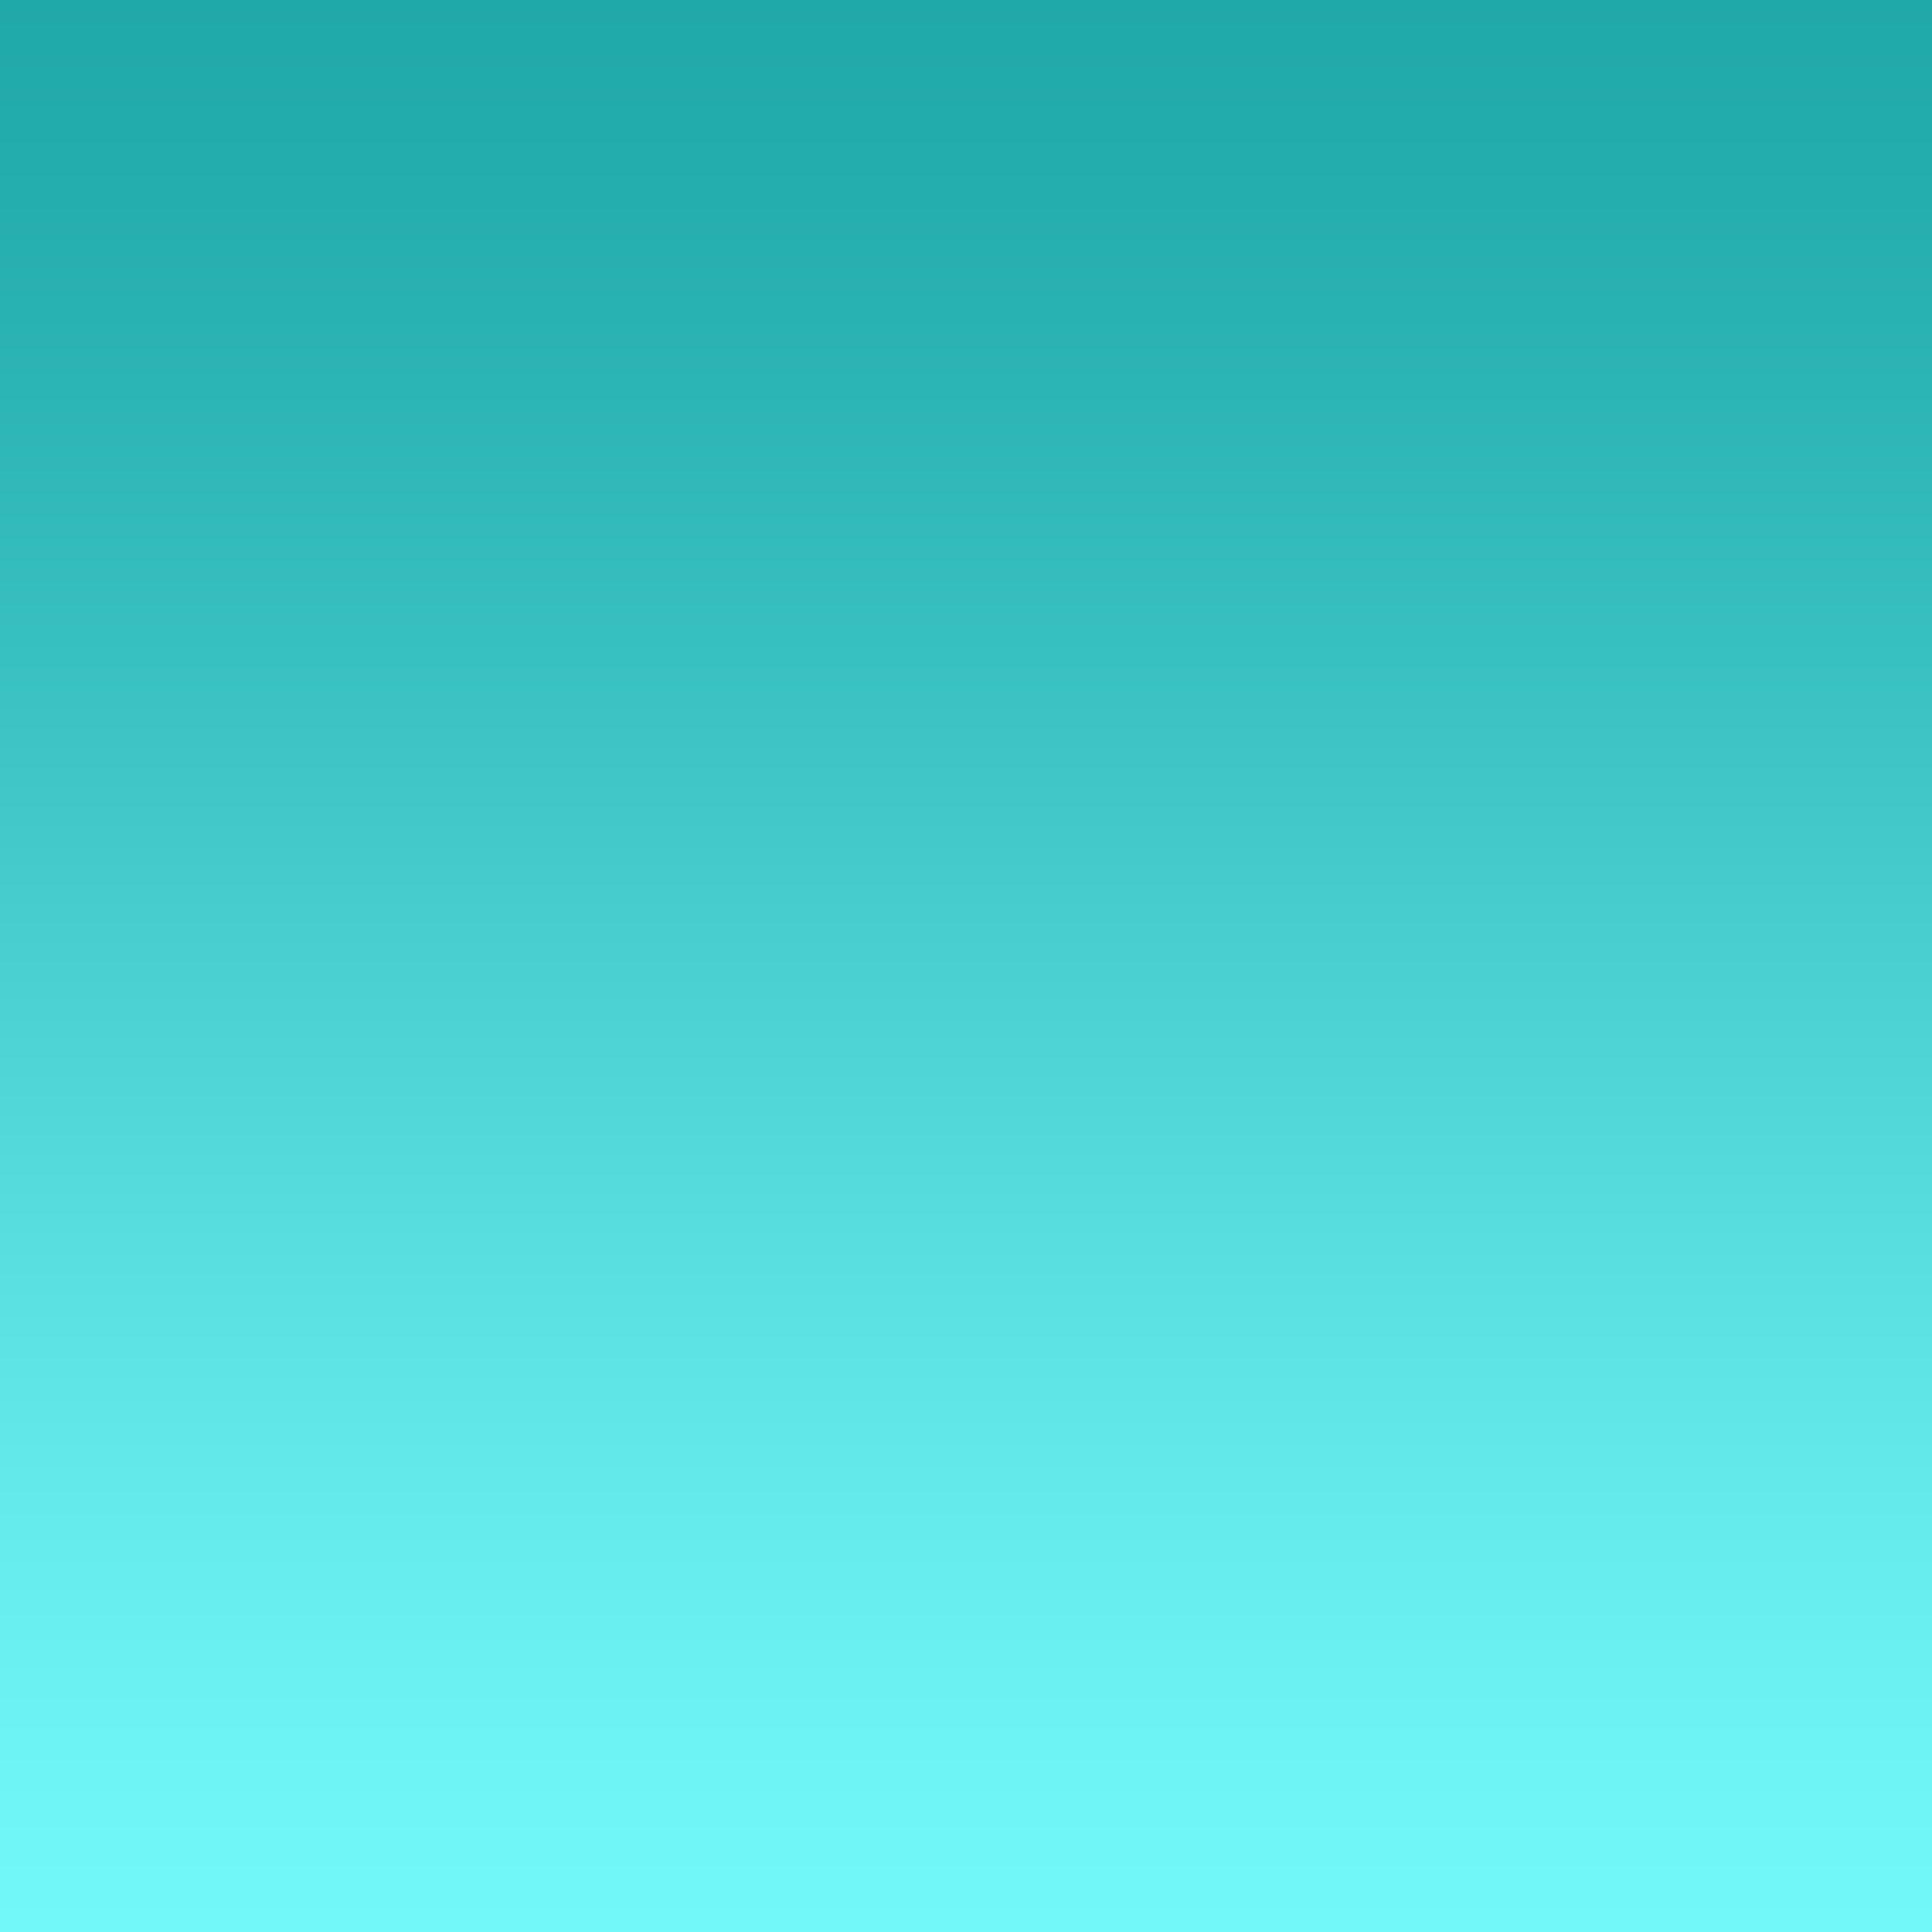 cyan moda icon logo